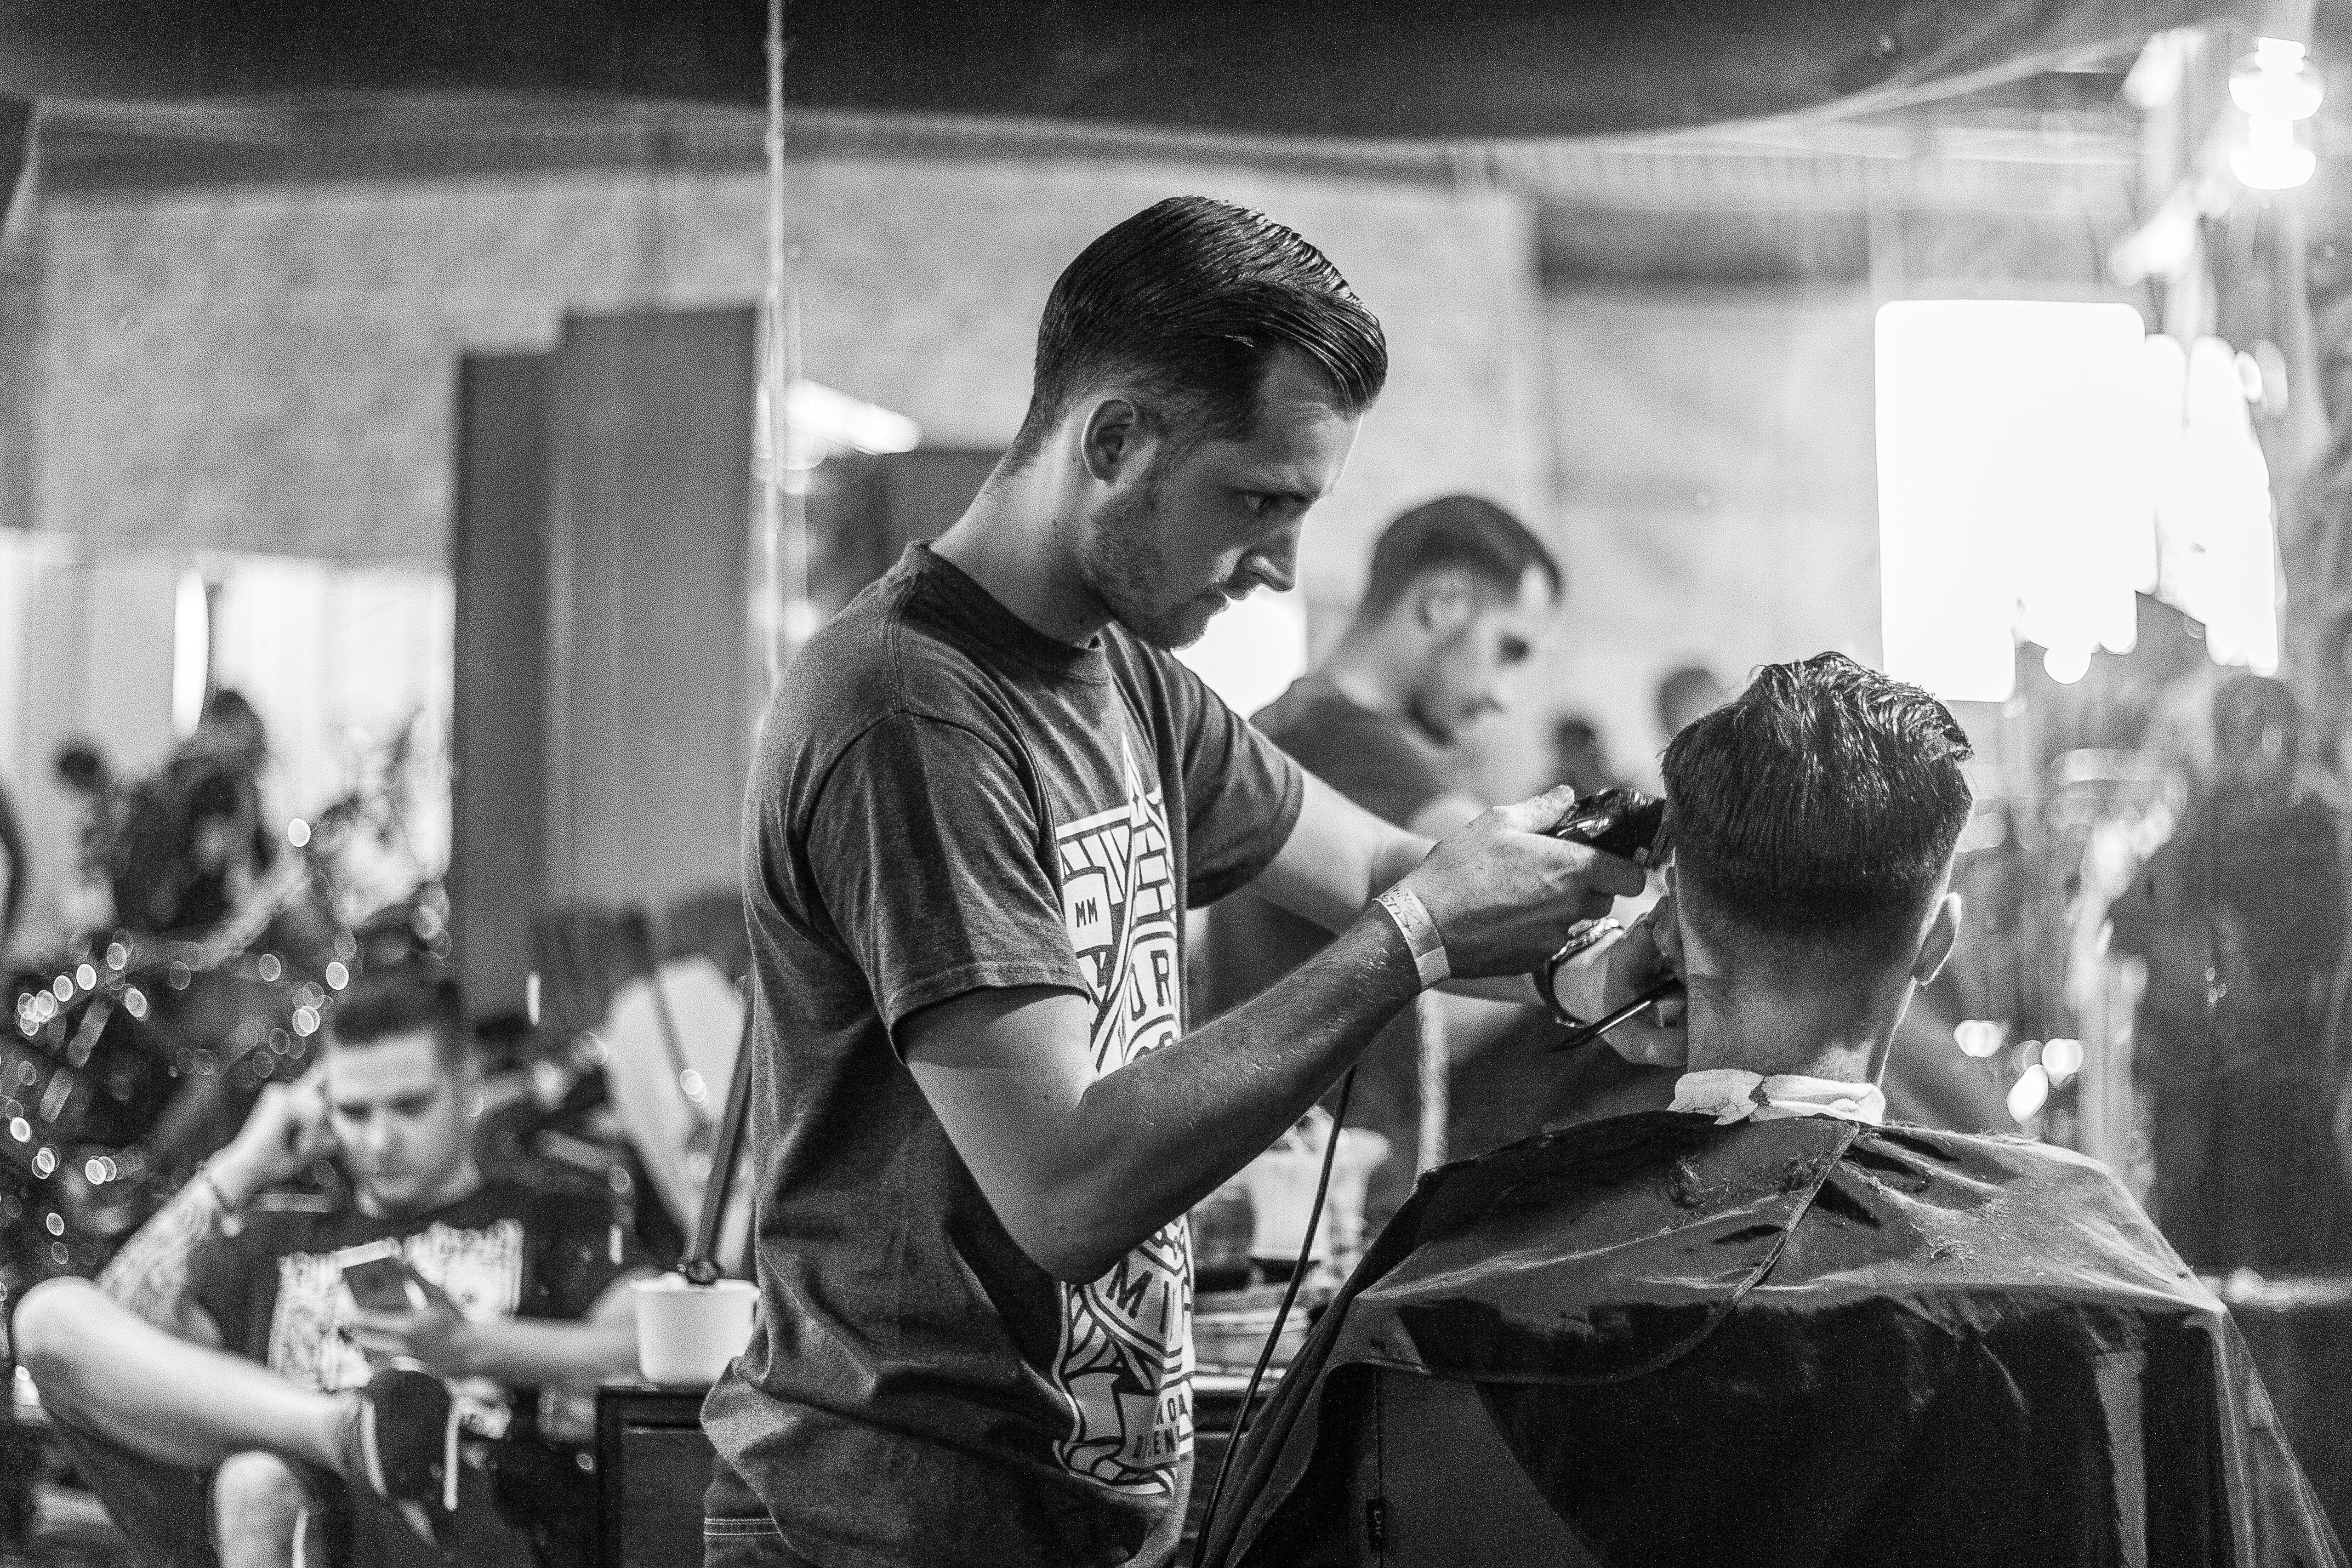 Barbero